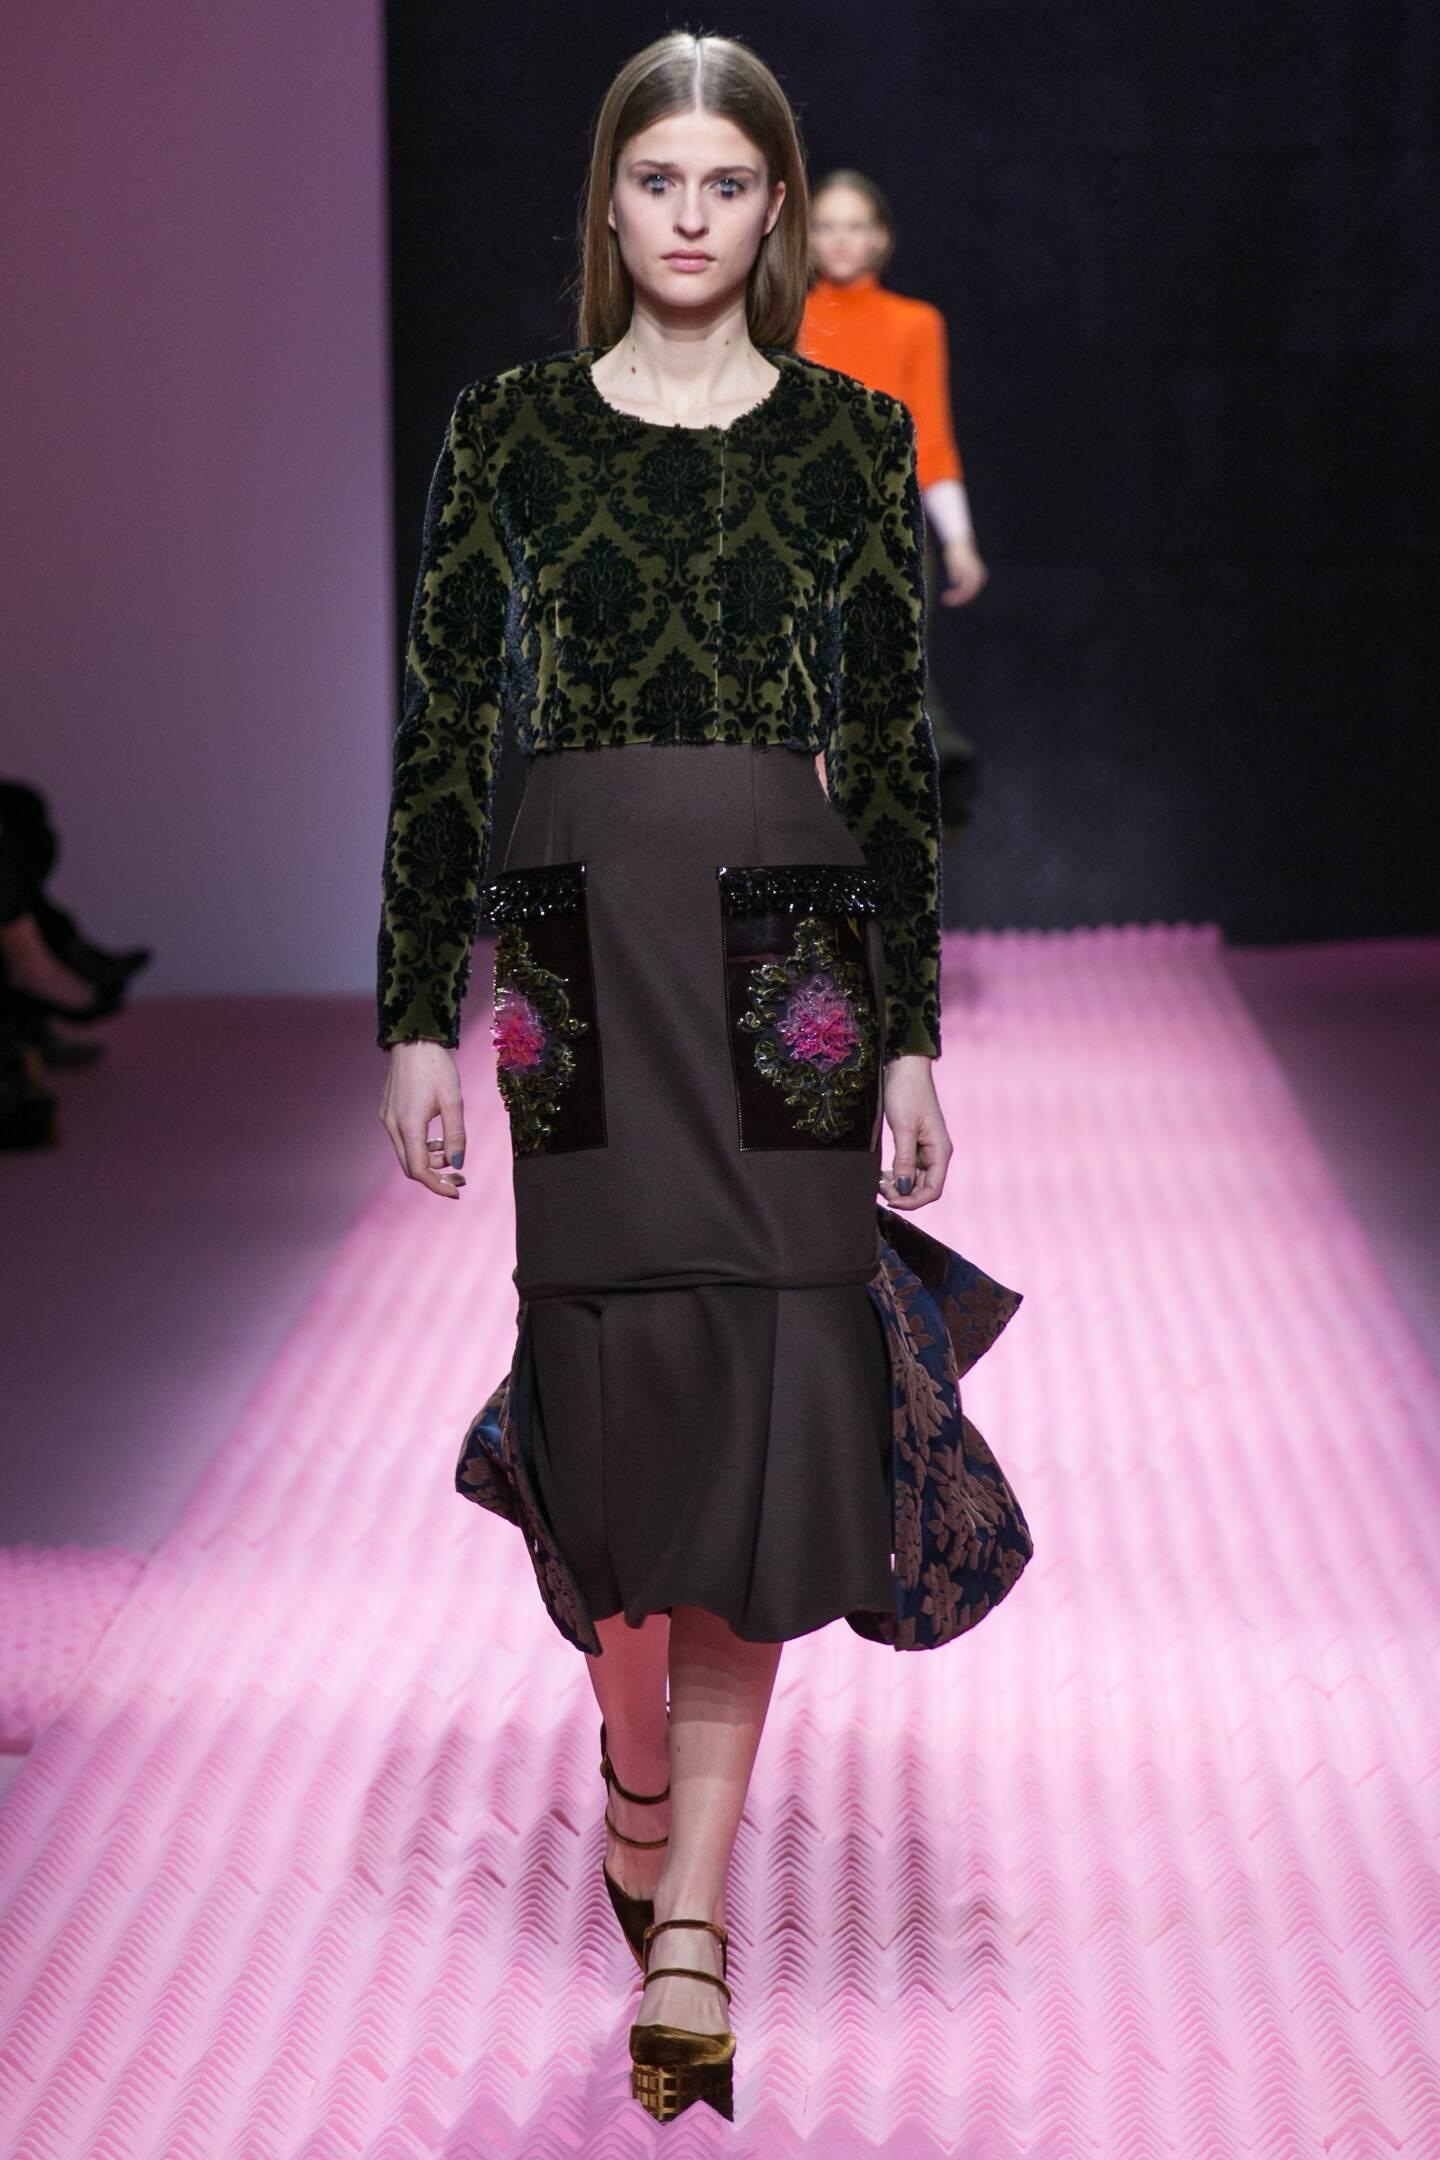 Winter 2015 Fashion Trends Mary Katrantzou Collection